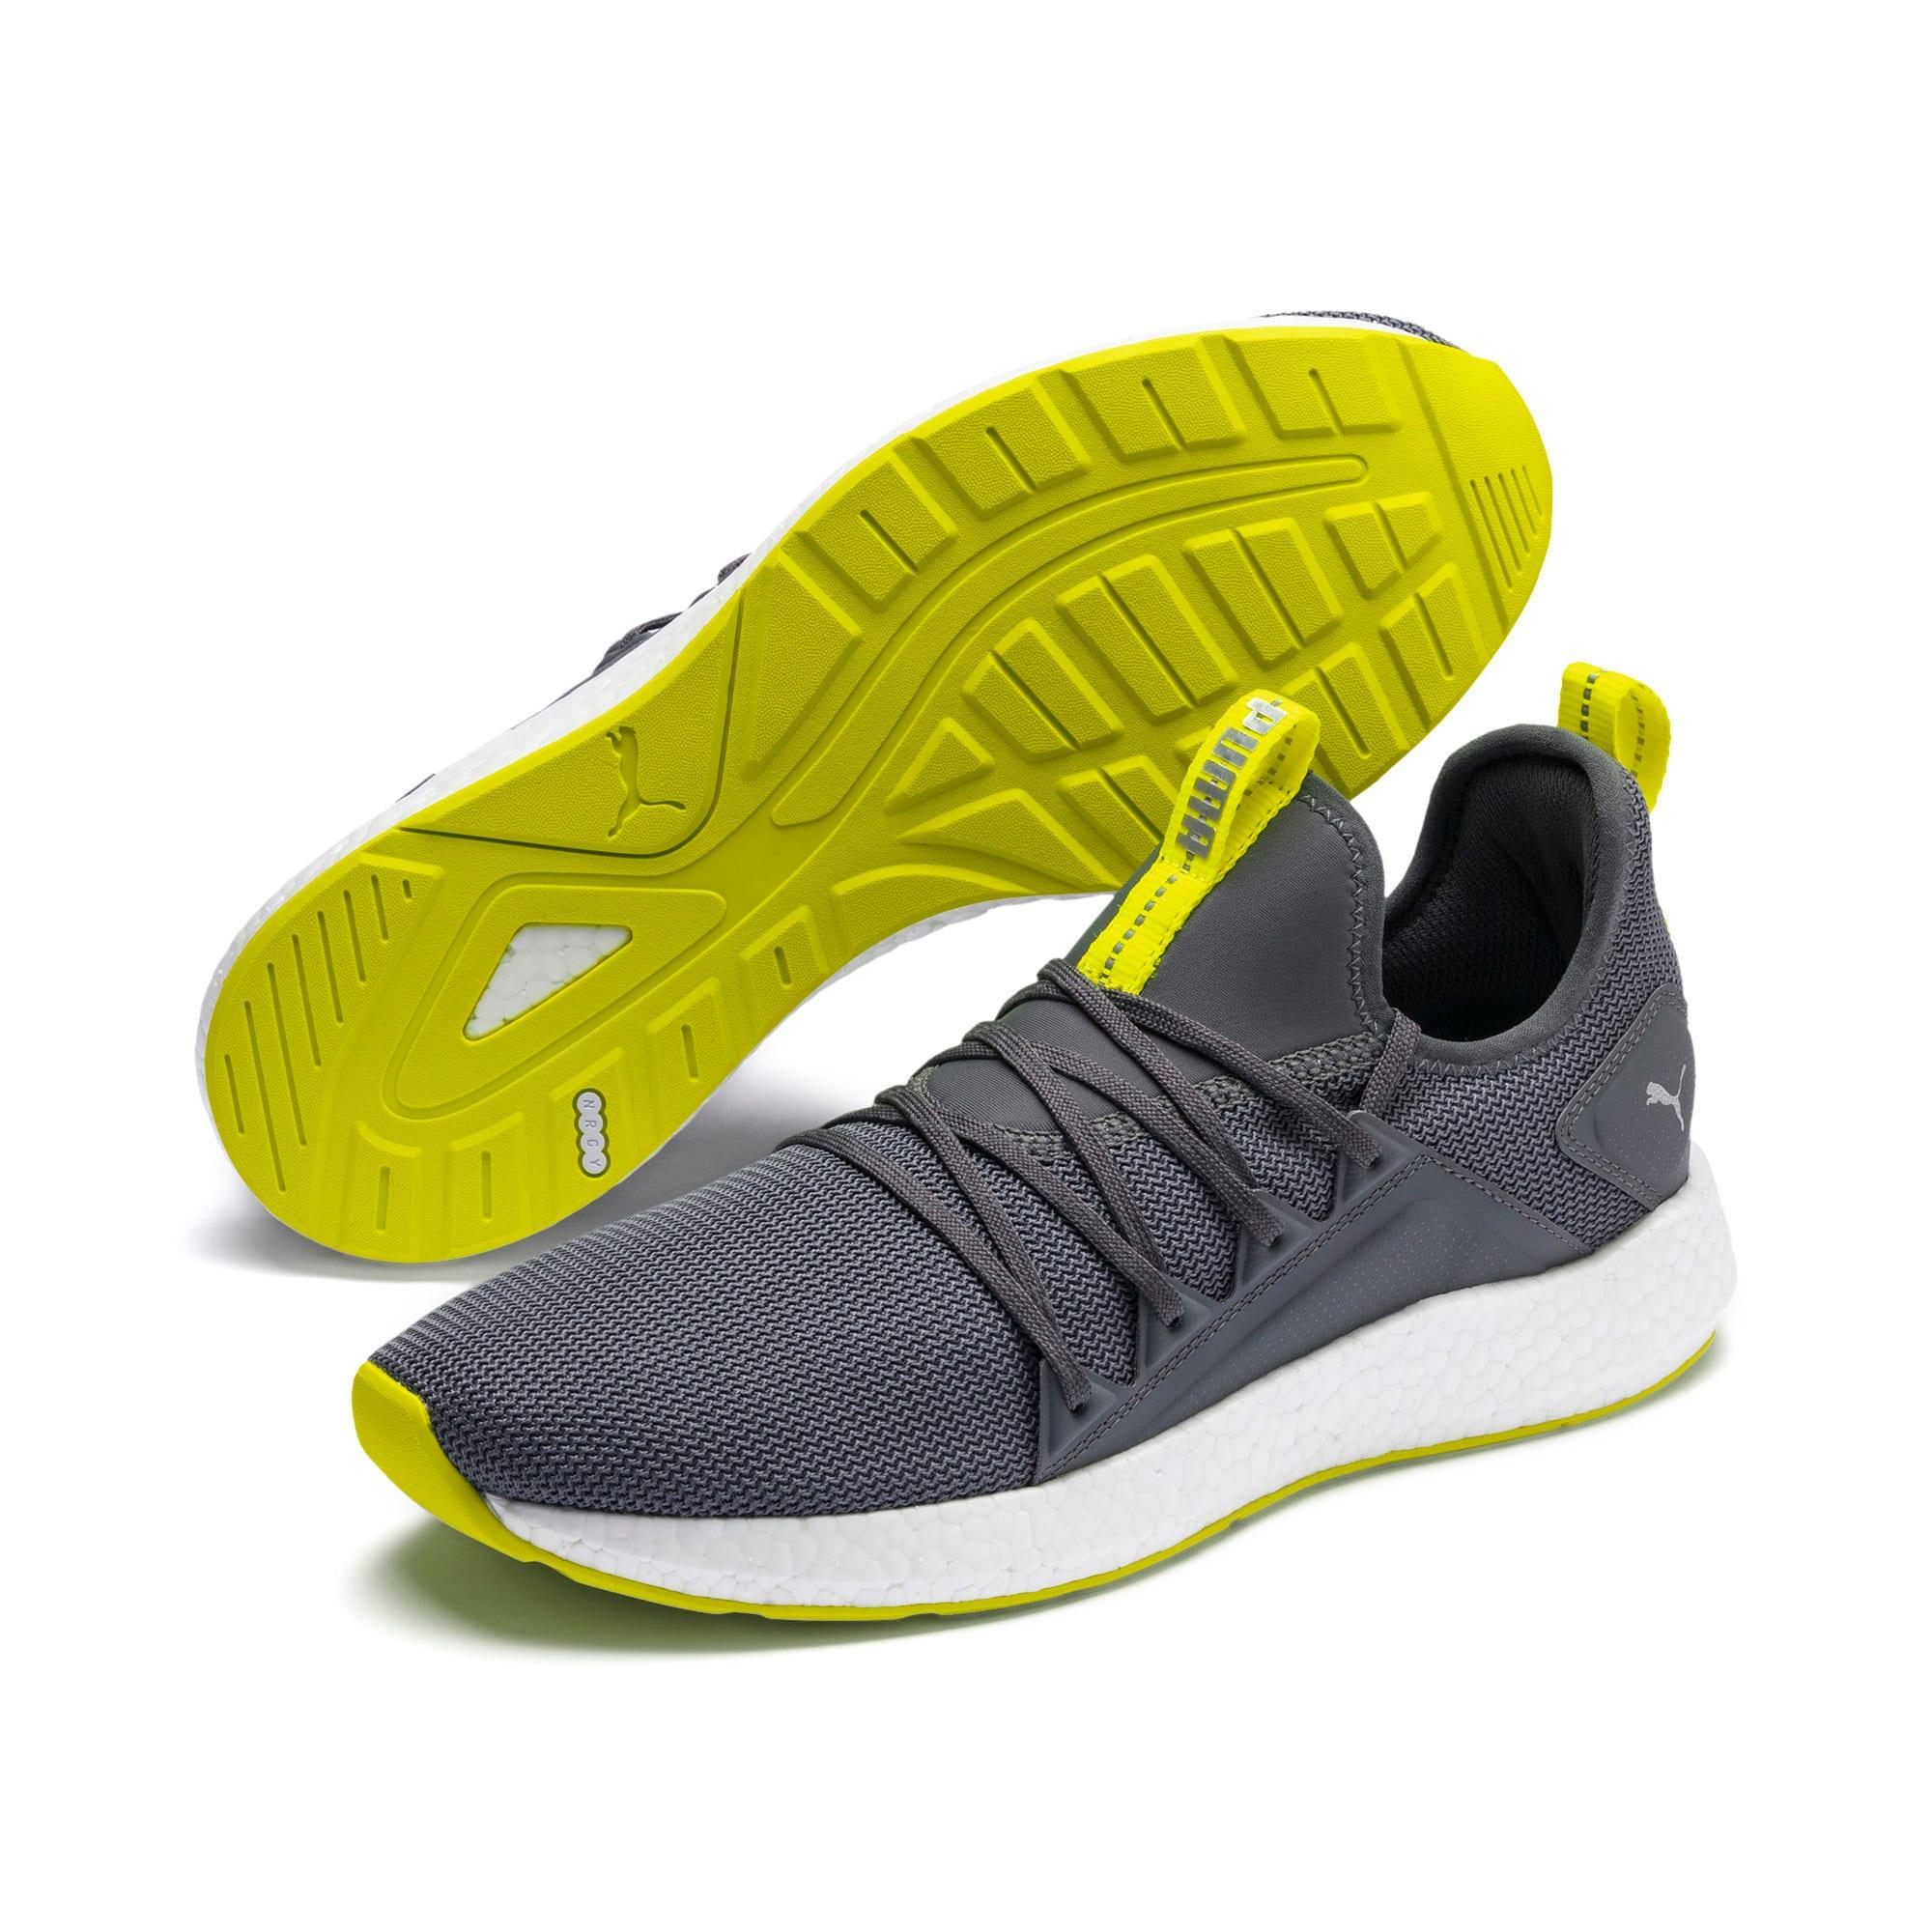 Thumbnail 8 of NRGY Neko Lights Men's Running Shoes, CASTLEROCK-Yellow Alert, medium-IND